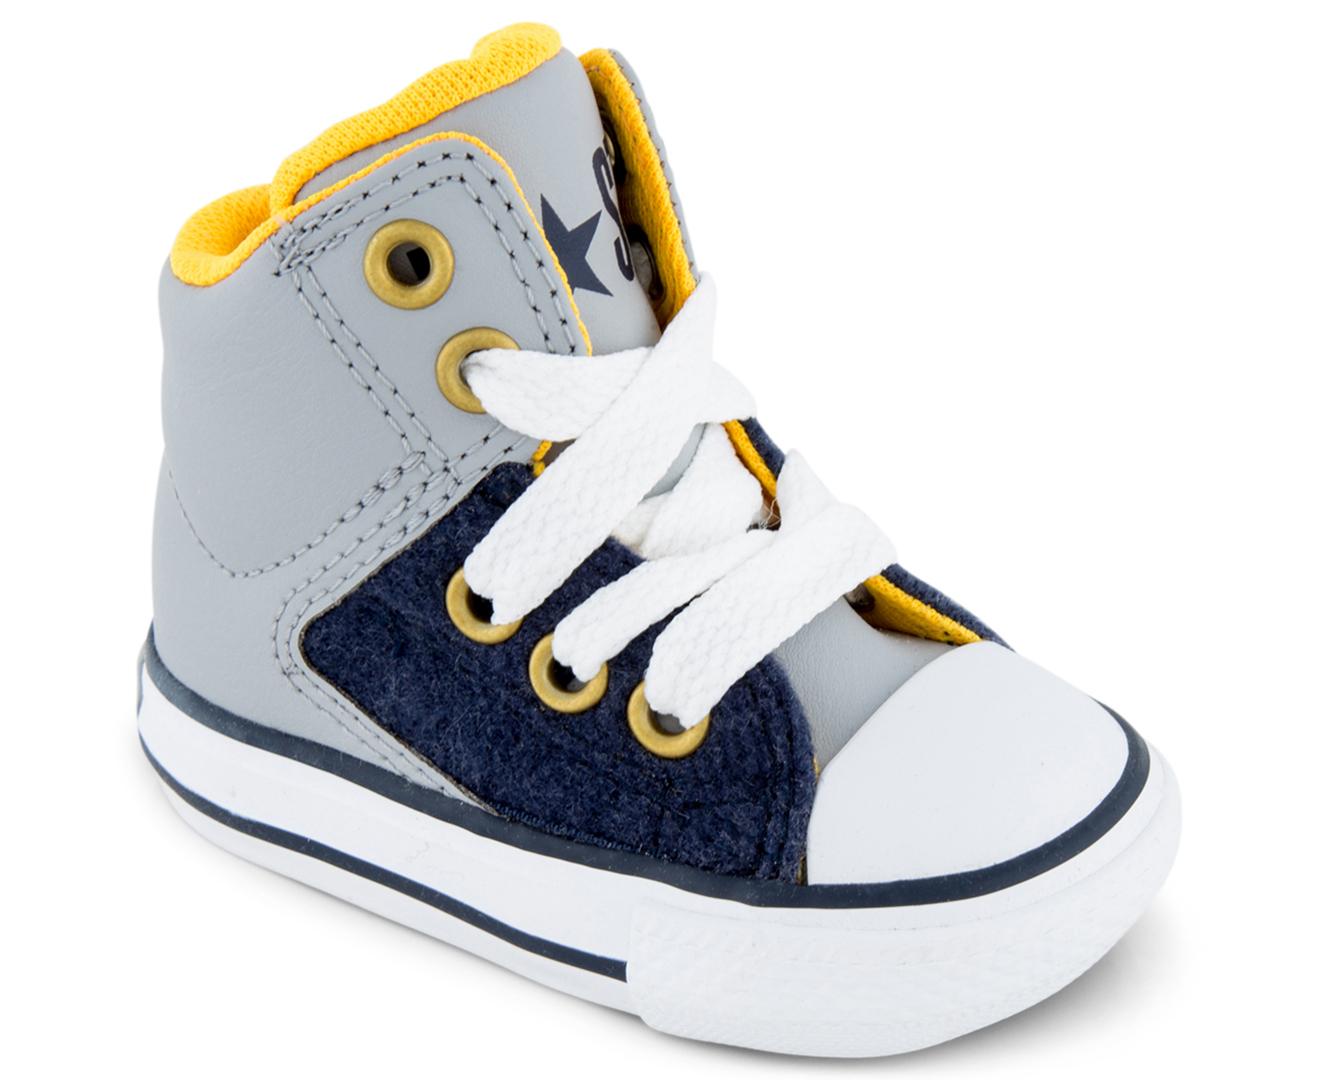 Converse Baby Toddler Chuck Taylor All Star High Street